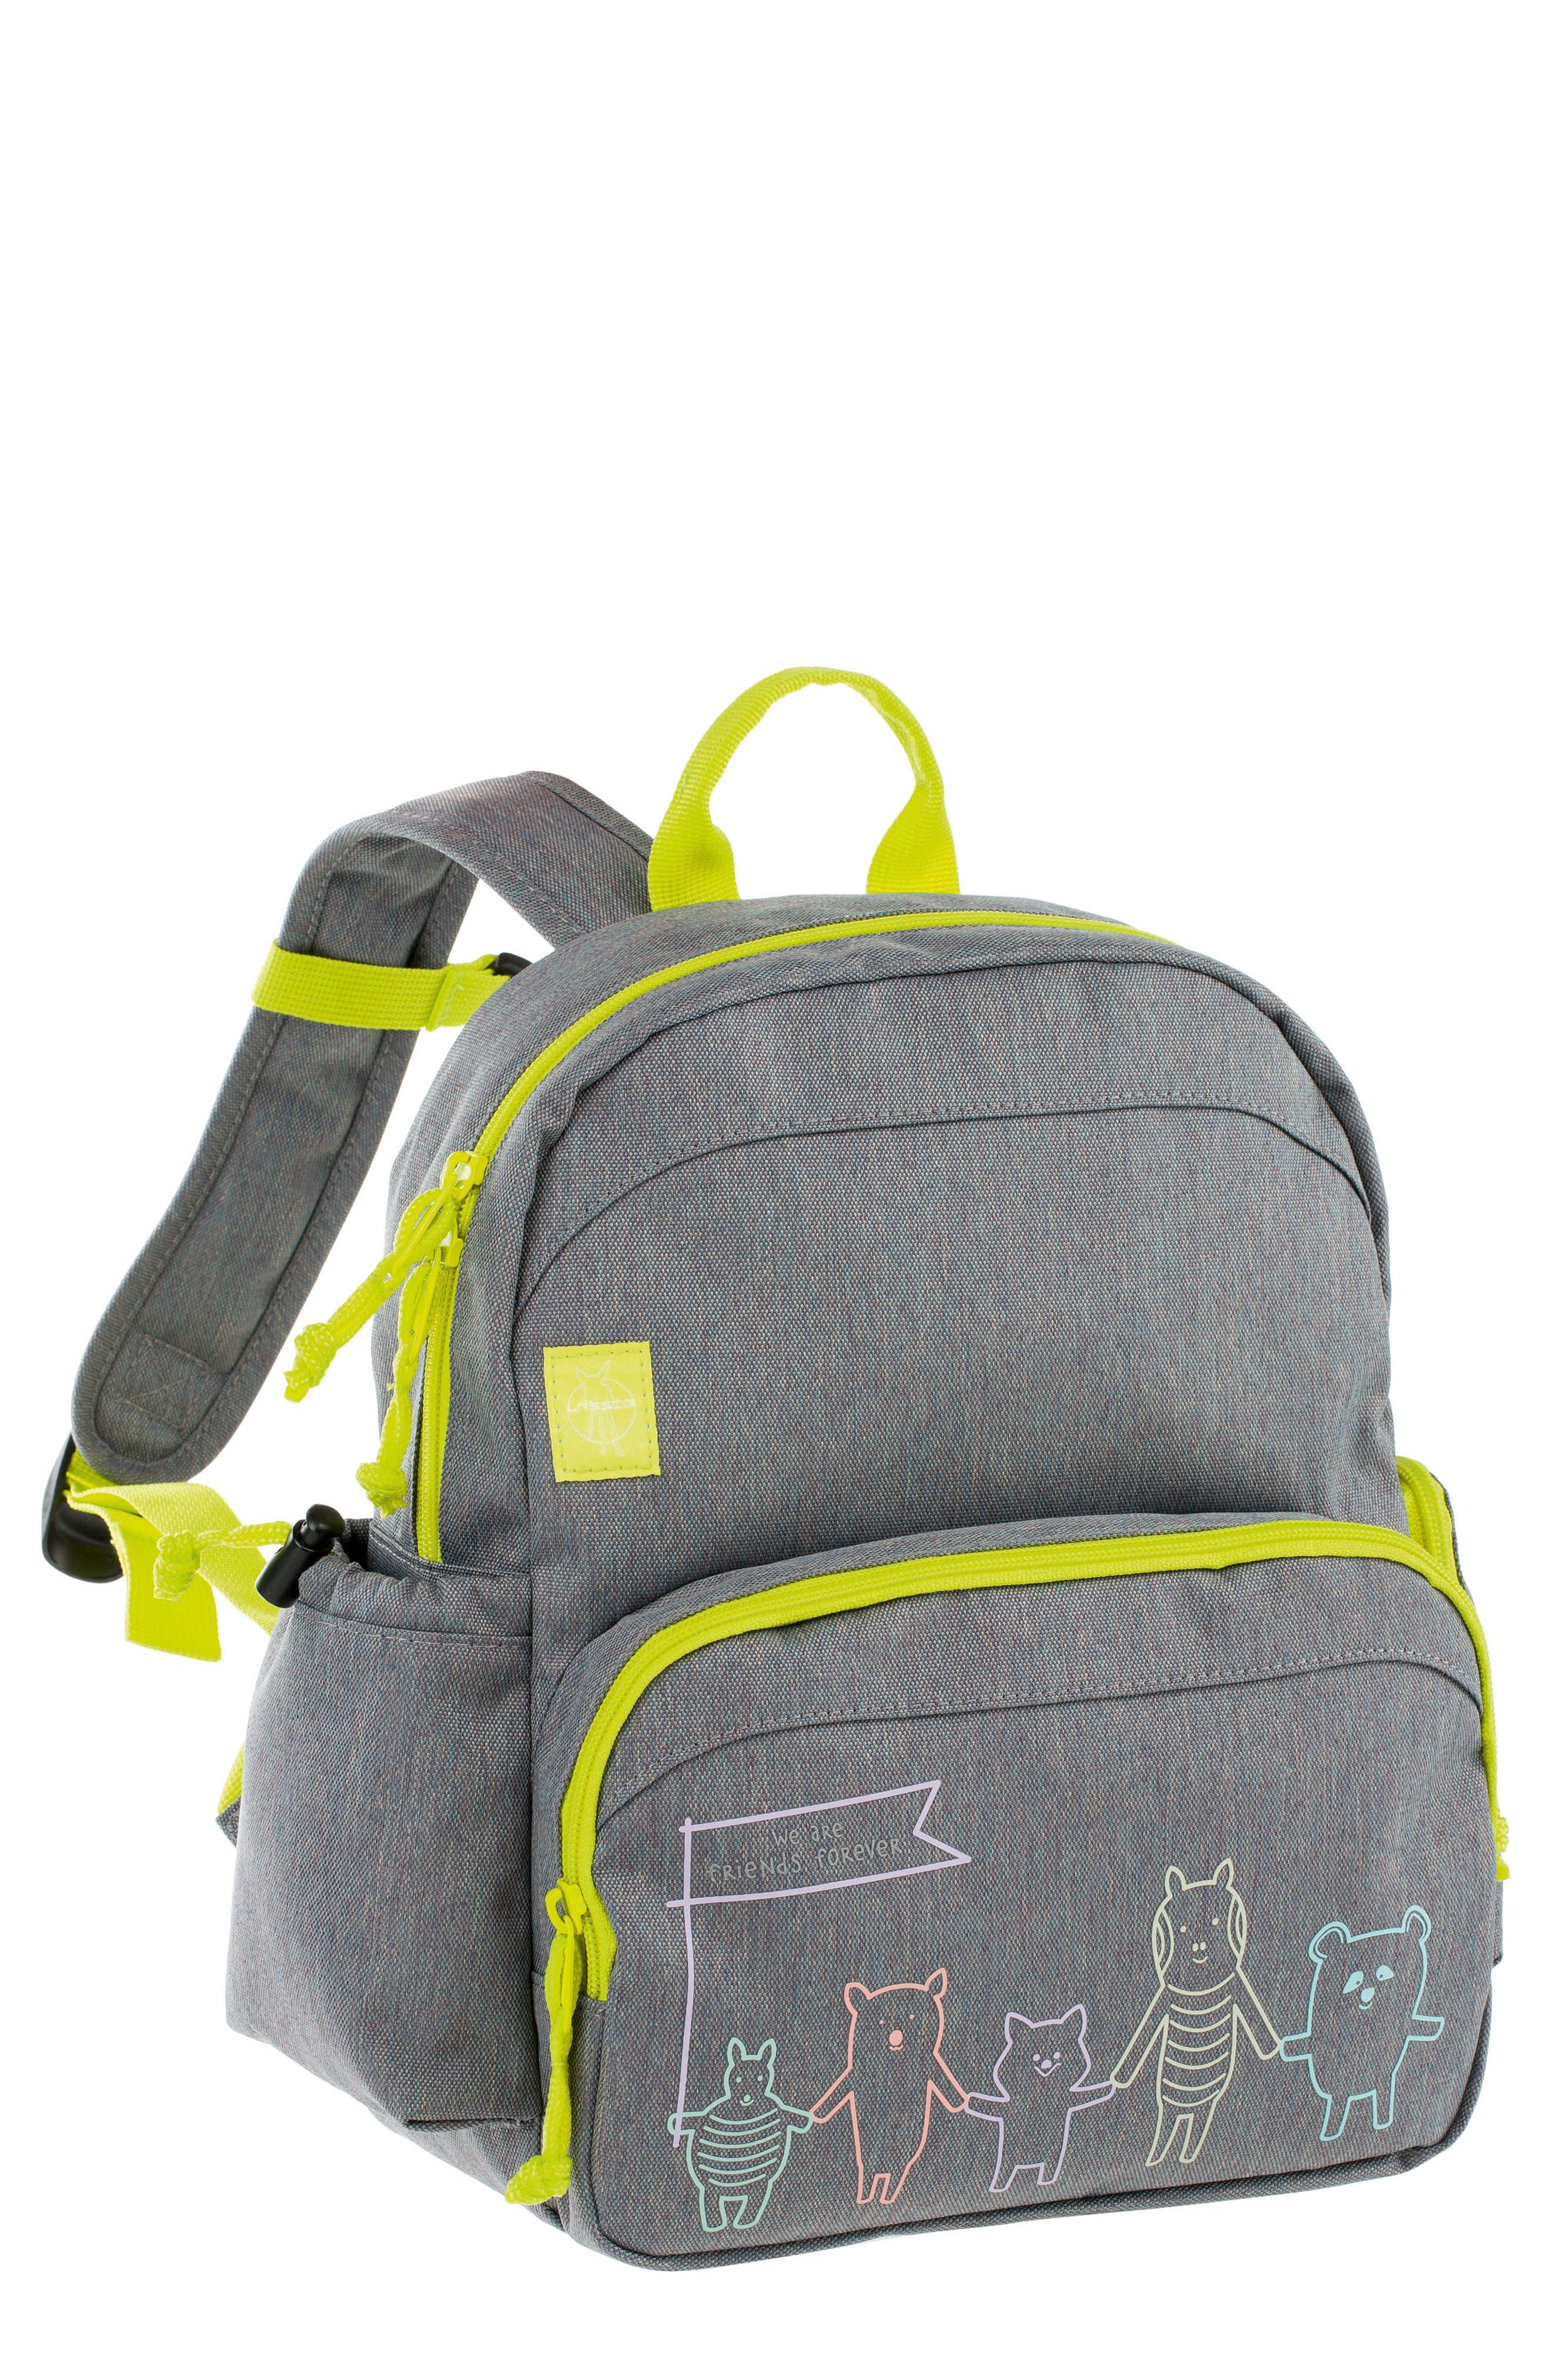 Lässig Medium About Friends Backpack (Kids)